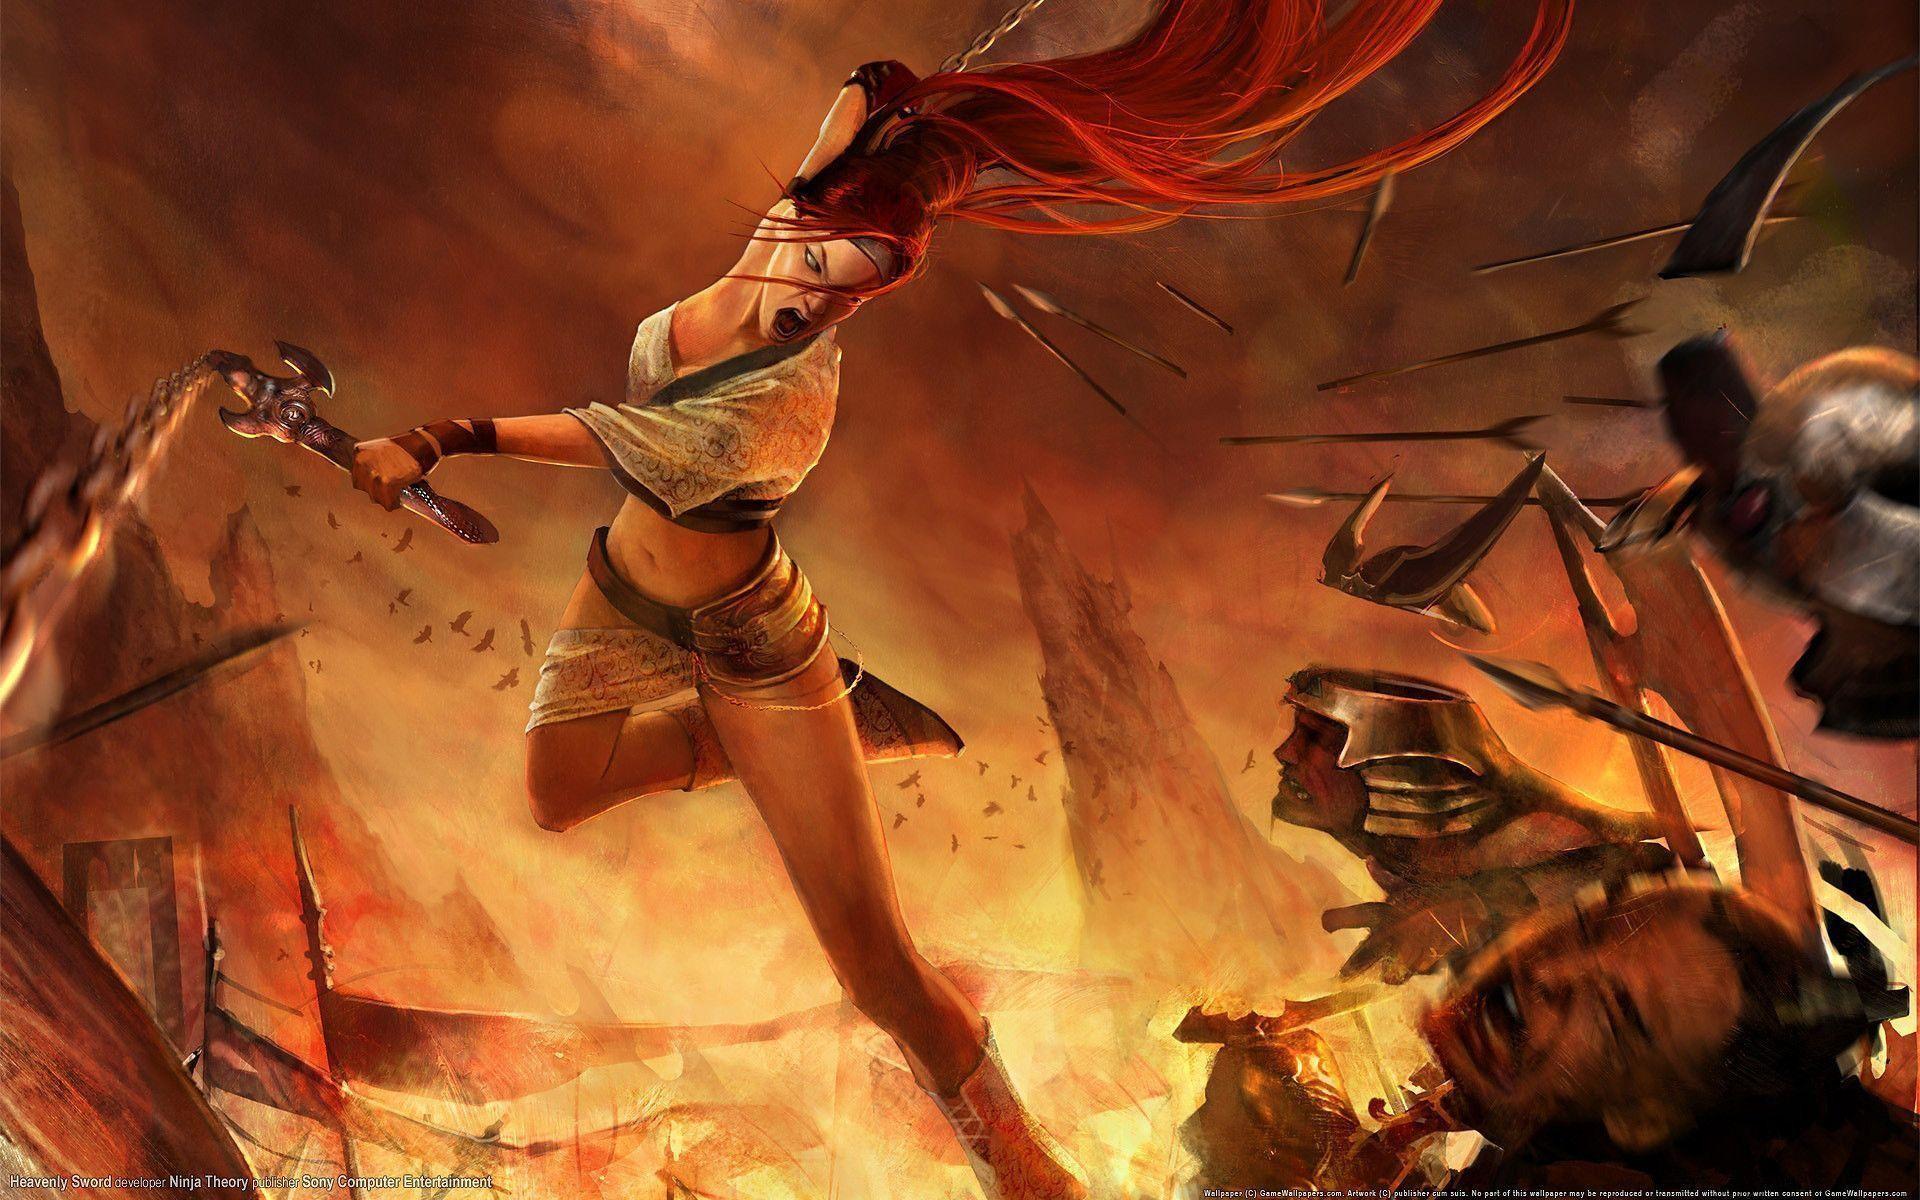 Heavenly Sword Wallpapers – Full HD wallpaper search